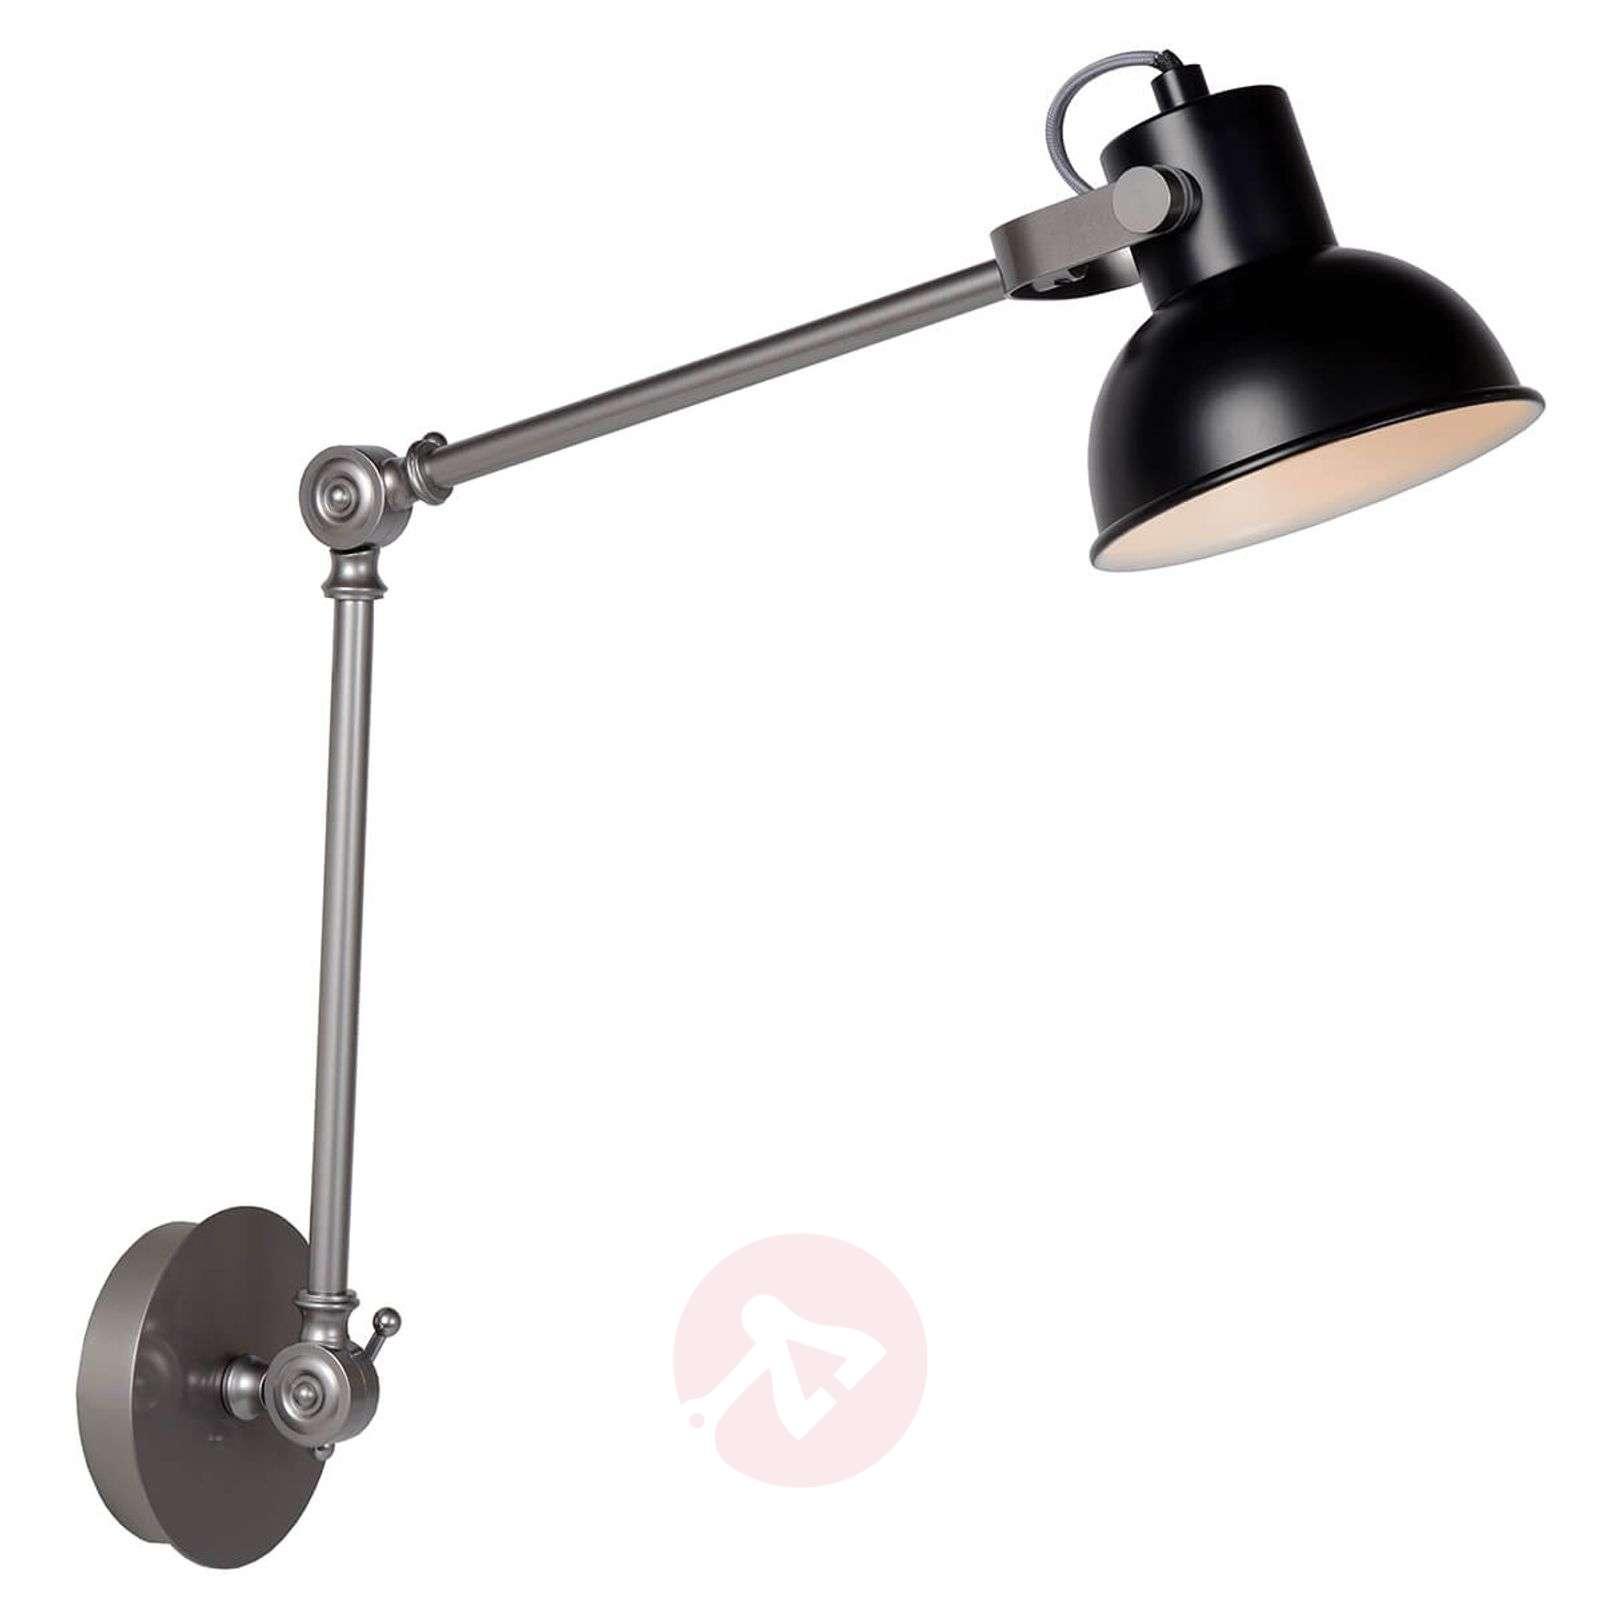 Adjustable wall light Crunch-6055180-01